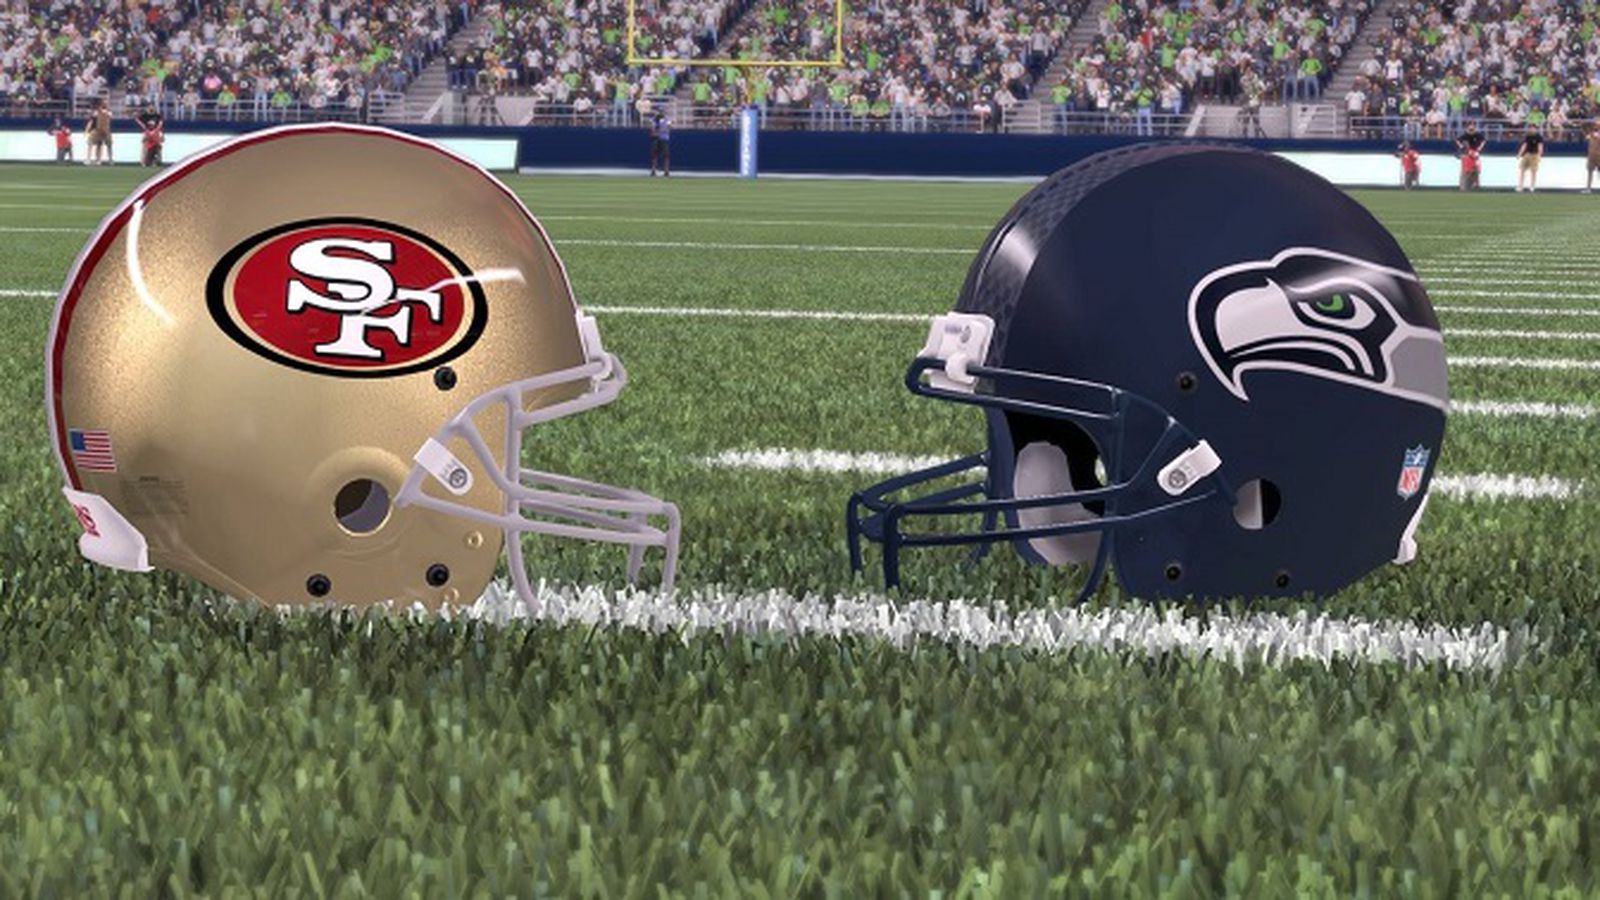 Image result for 49ers vs seahawks